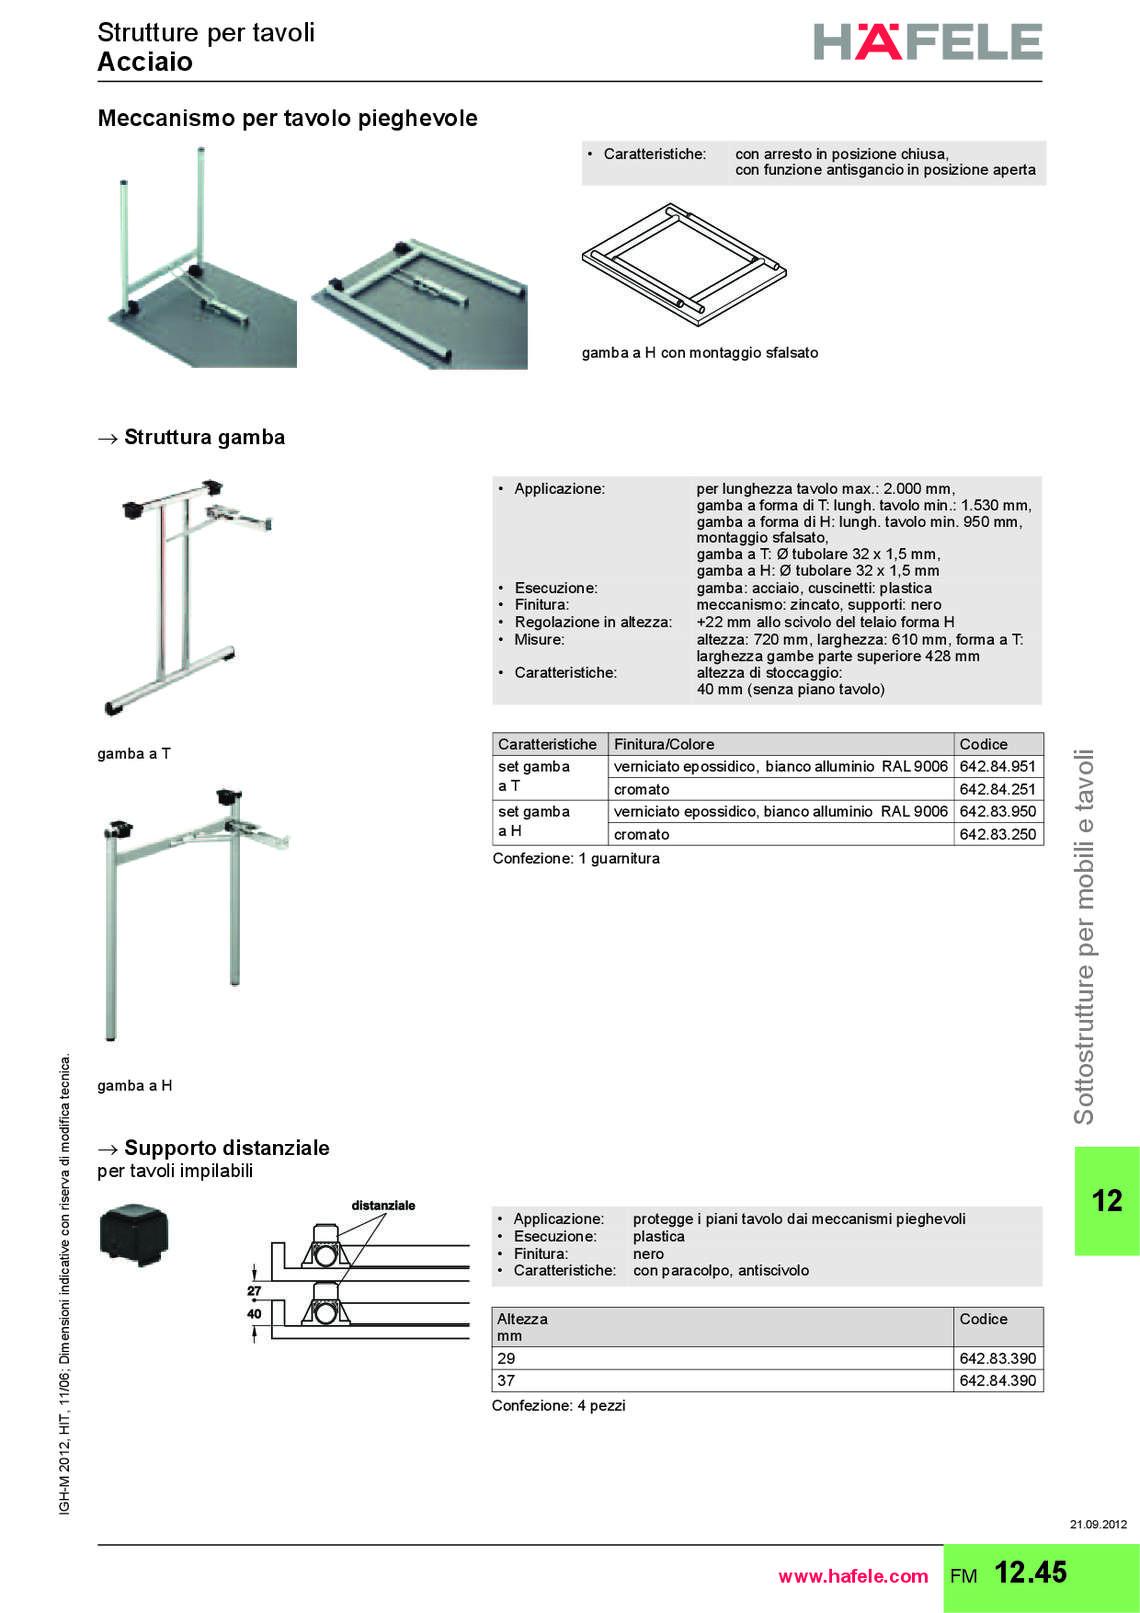 hafele-sottostrutture-per-mobili_83_068.jpg